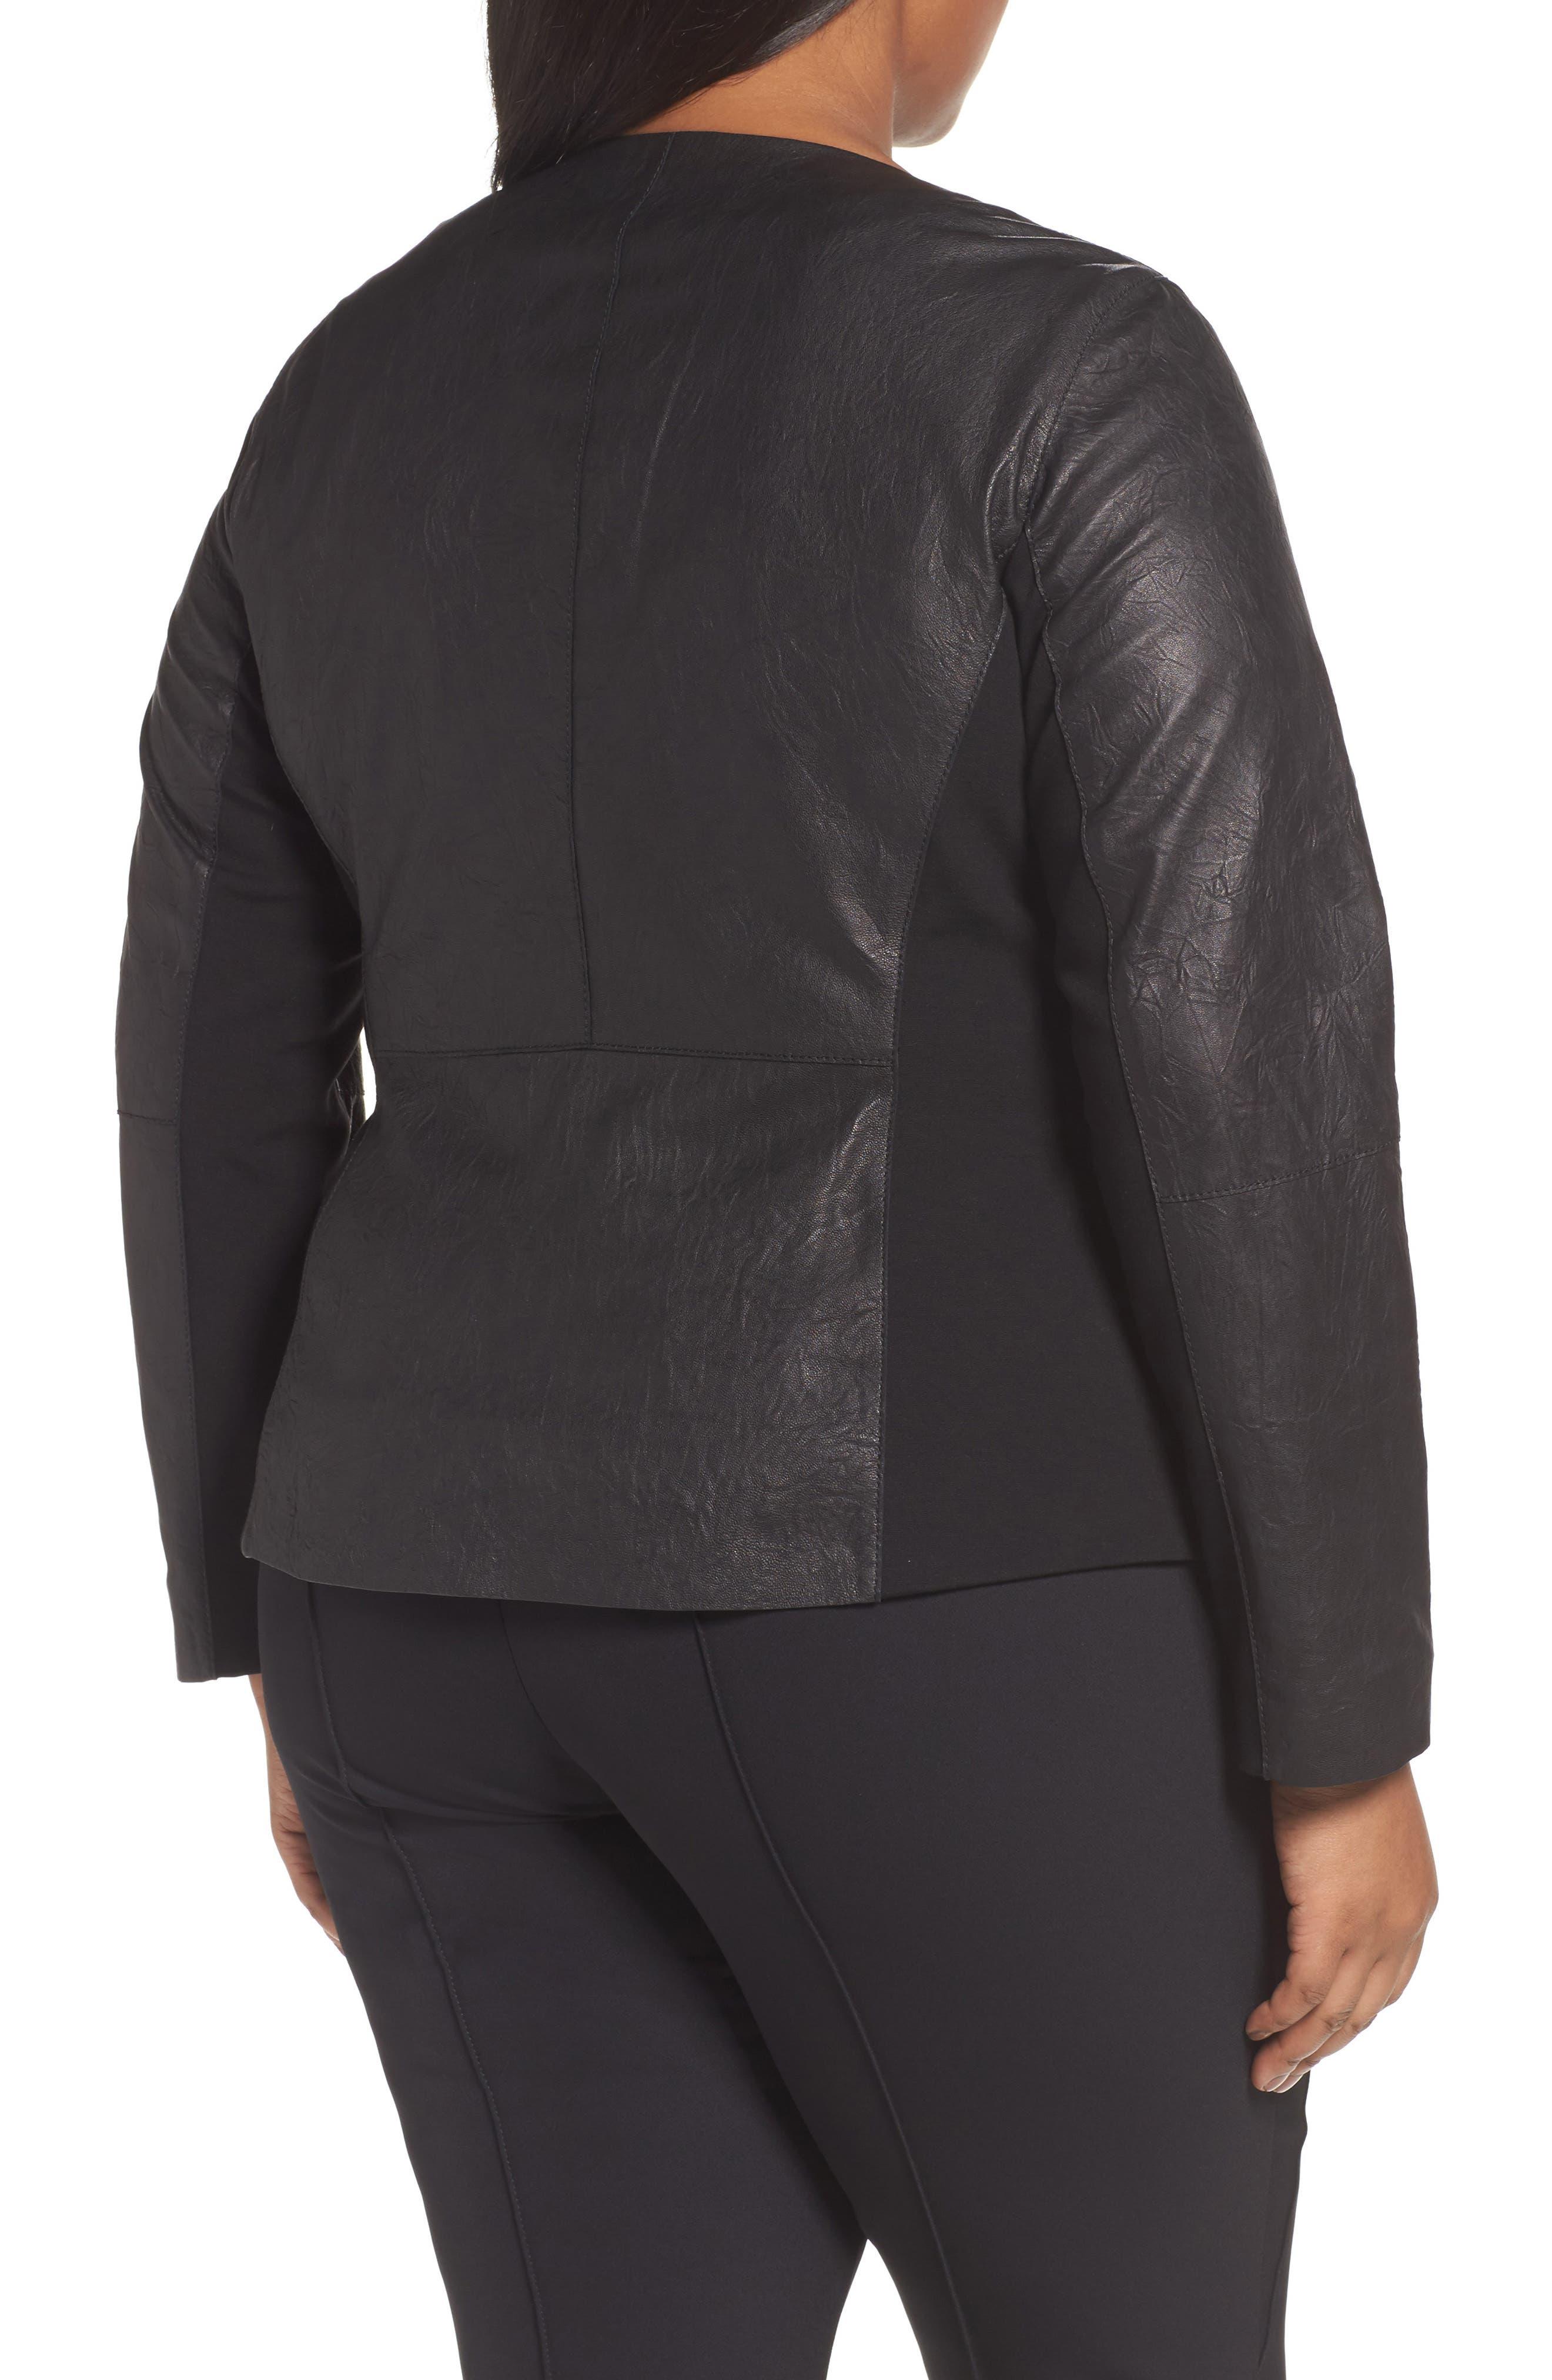 Aimes Leather Jacket,                             Alternate thumbnail 2, color,